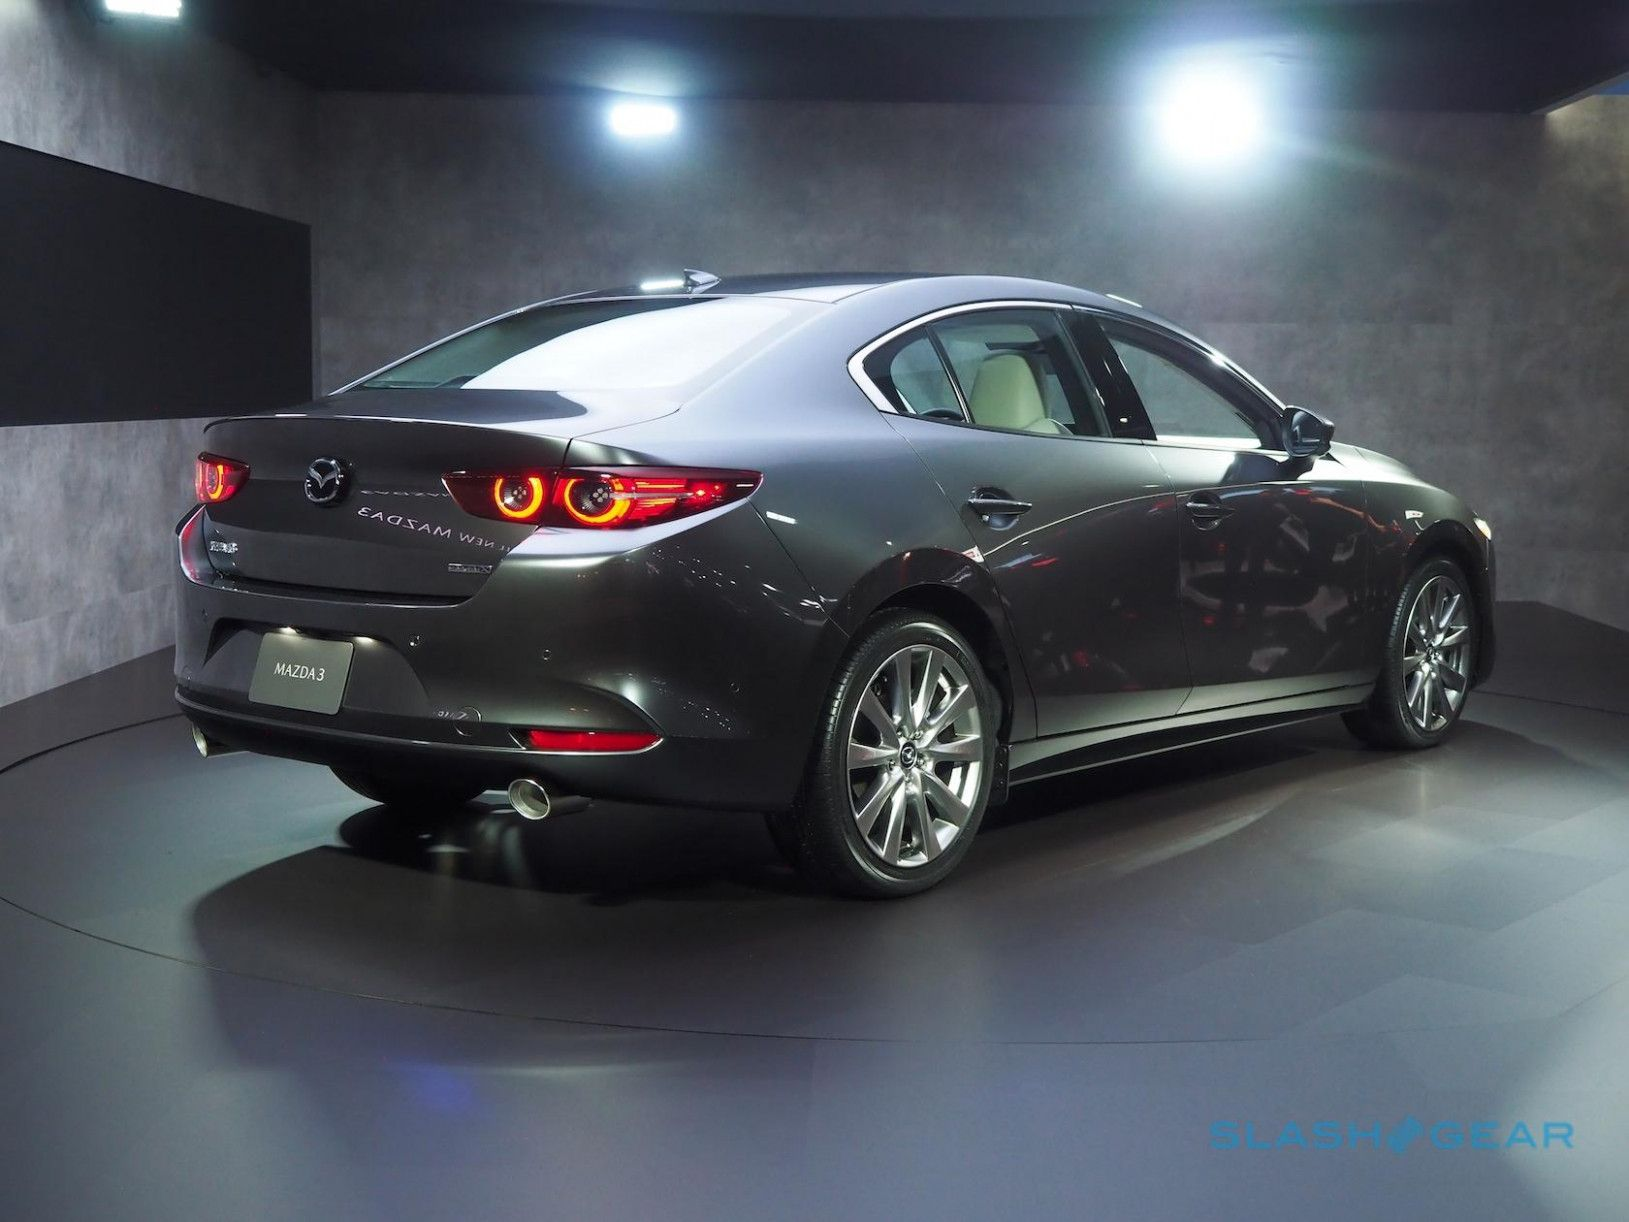 2020 Mazda Mazda3 Release Mazda Mazda3 Mazda Mazda 6 Hatchback